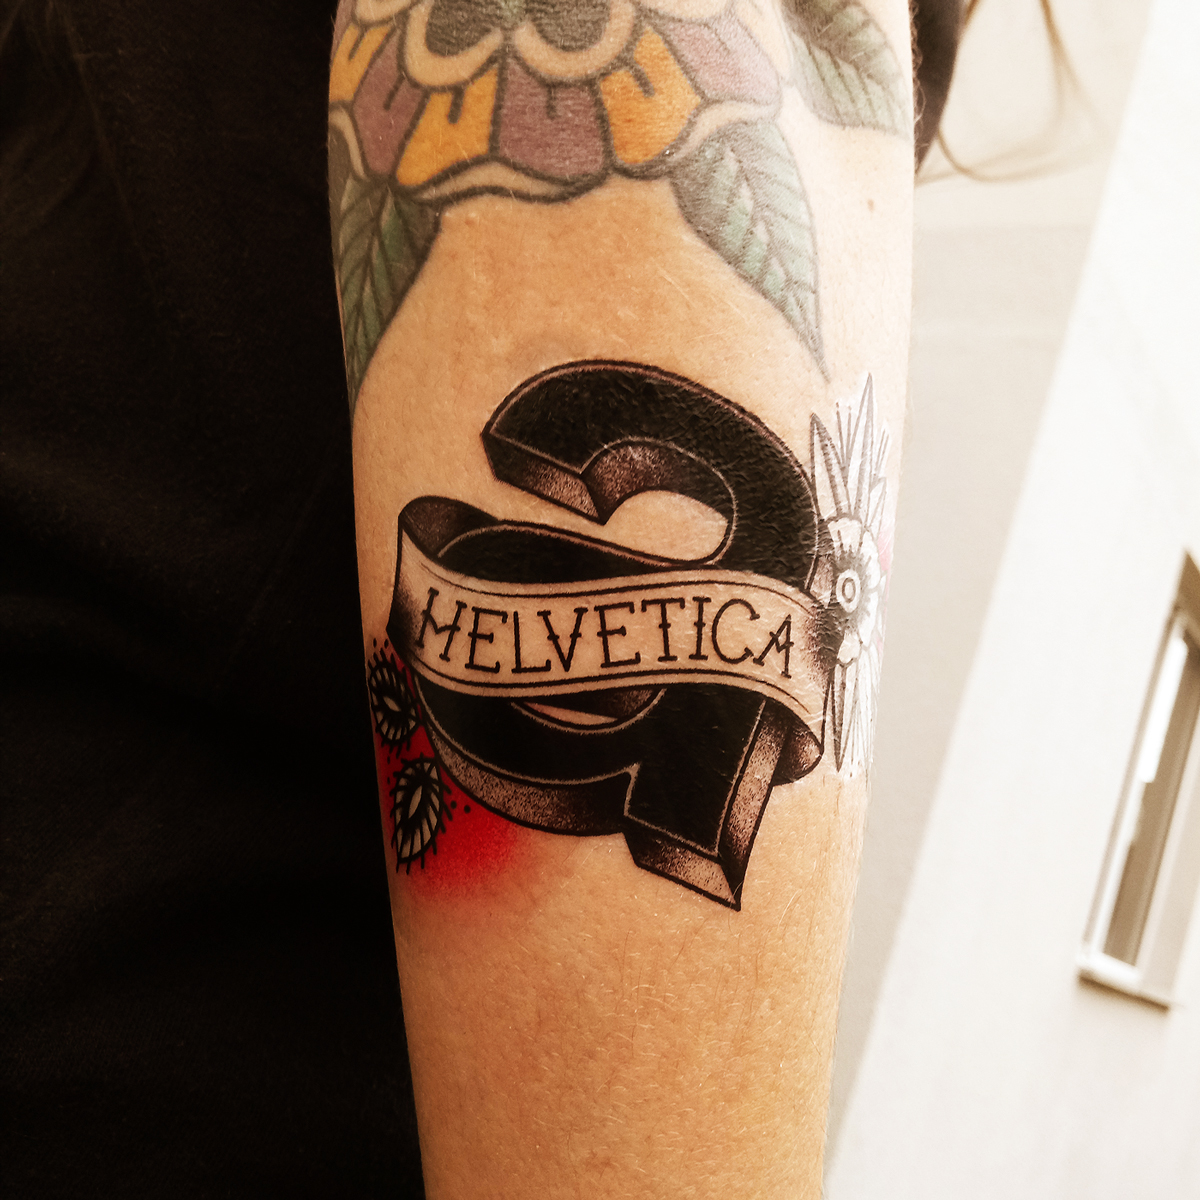 Amazing body art turns typefaces into tattoos